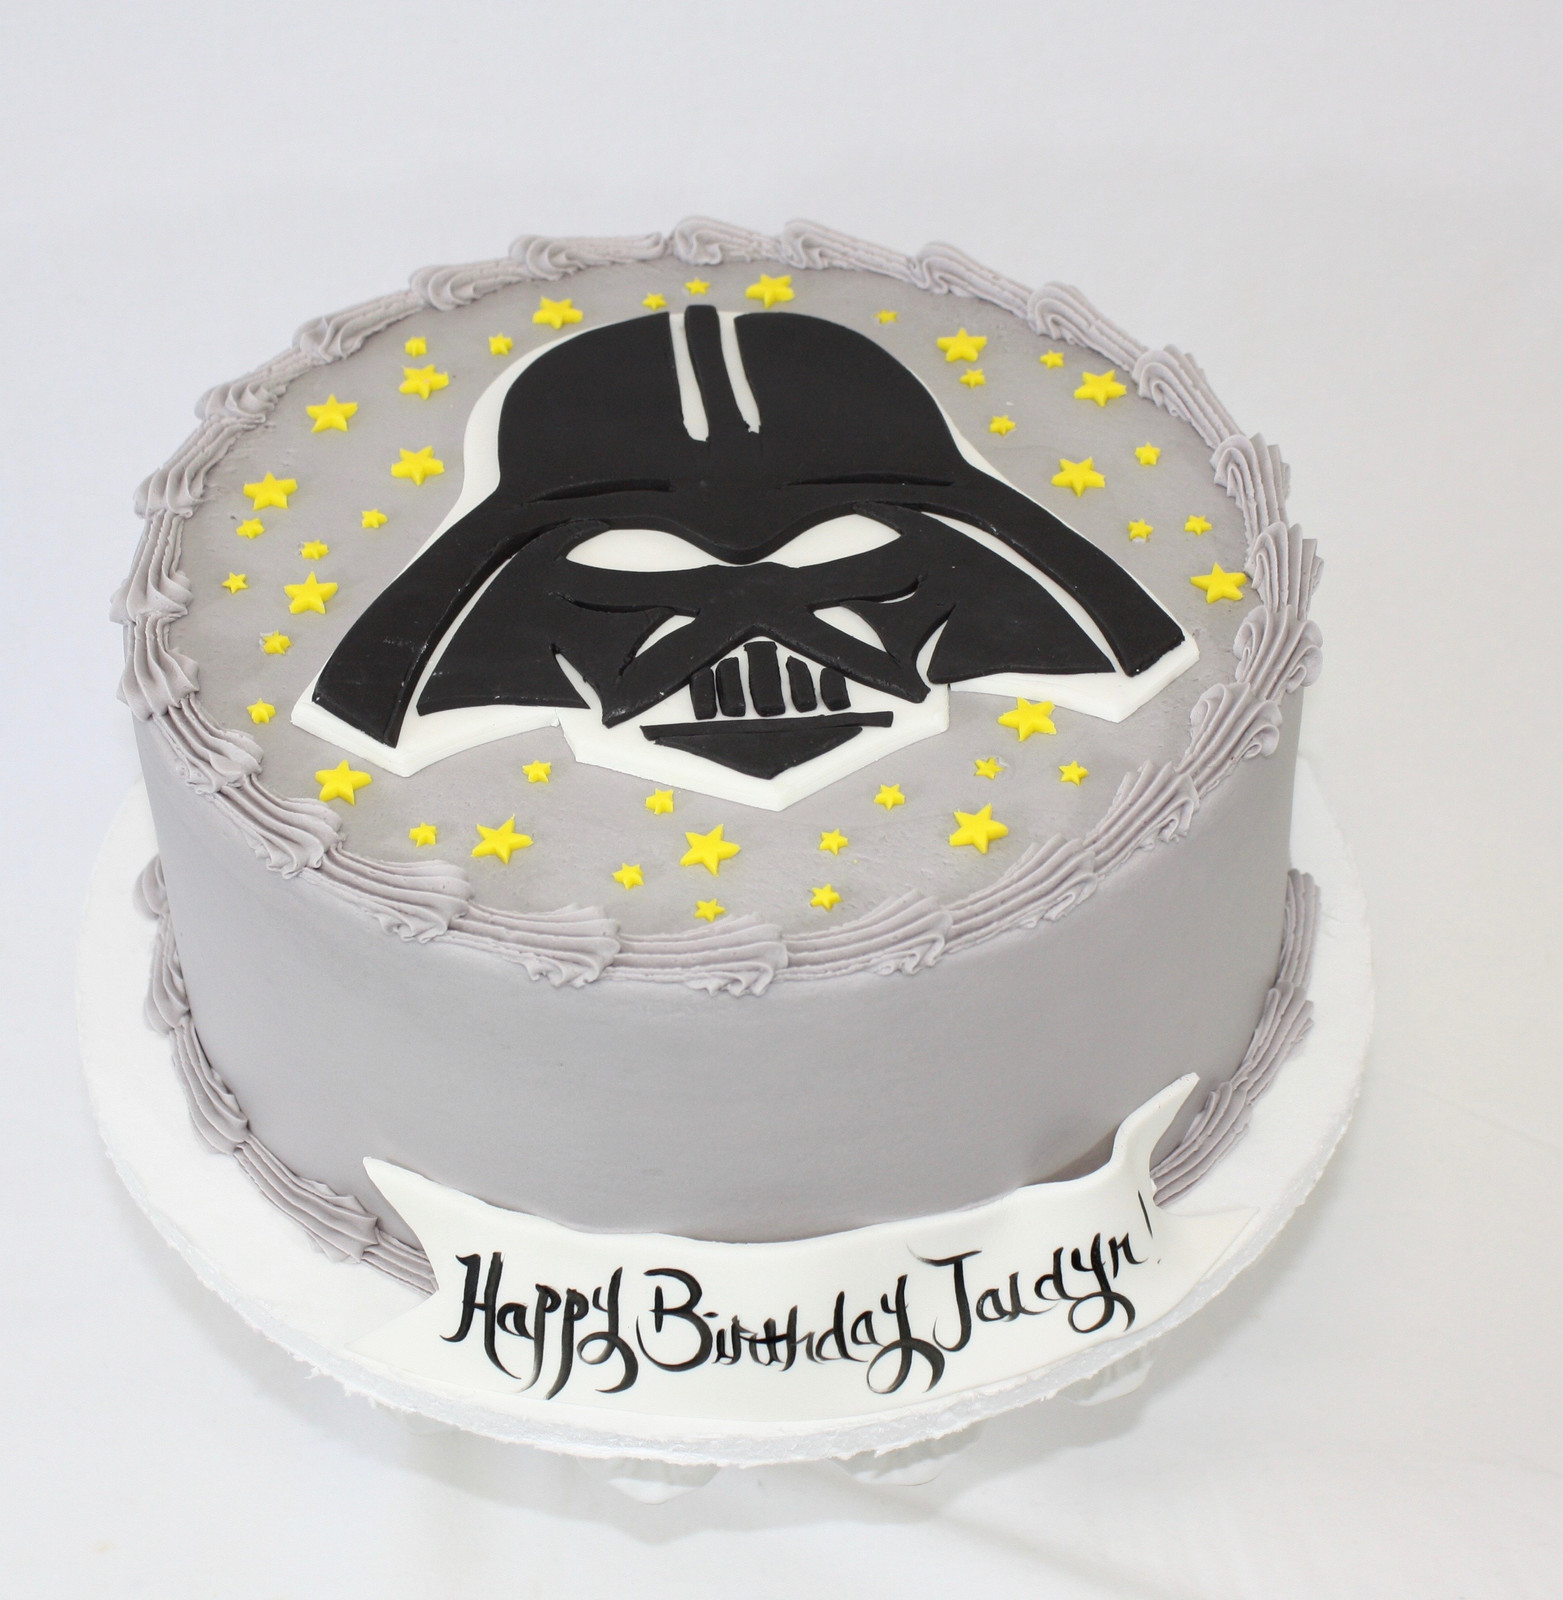 Childrens Birthday Cakes Atlanta Confection Perfection